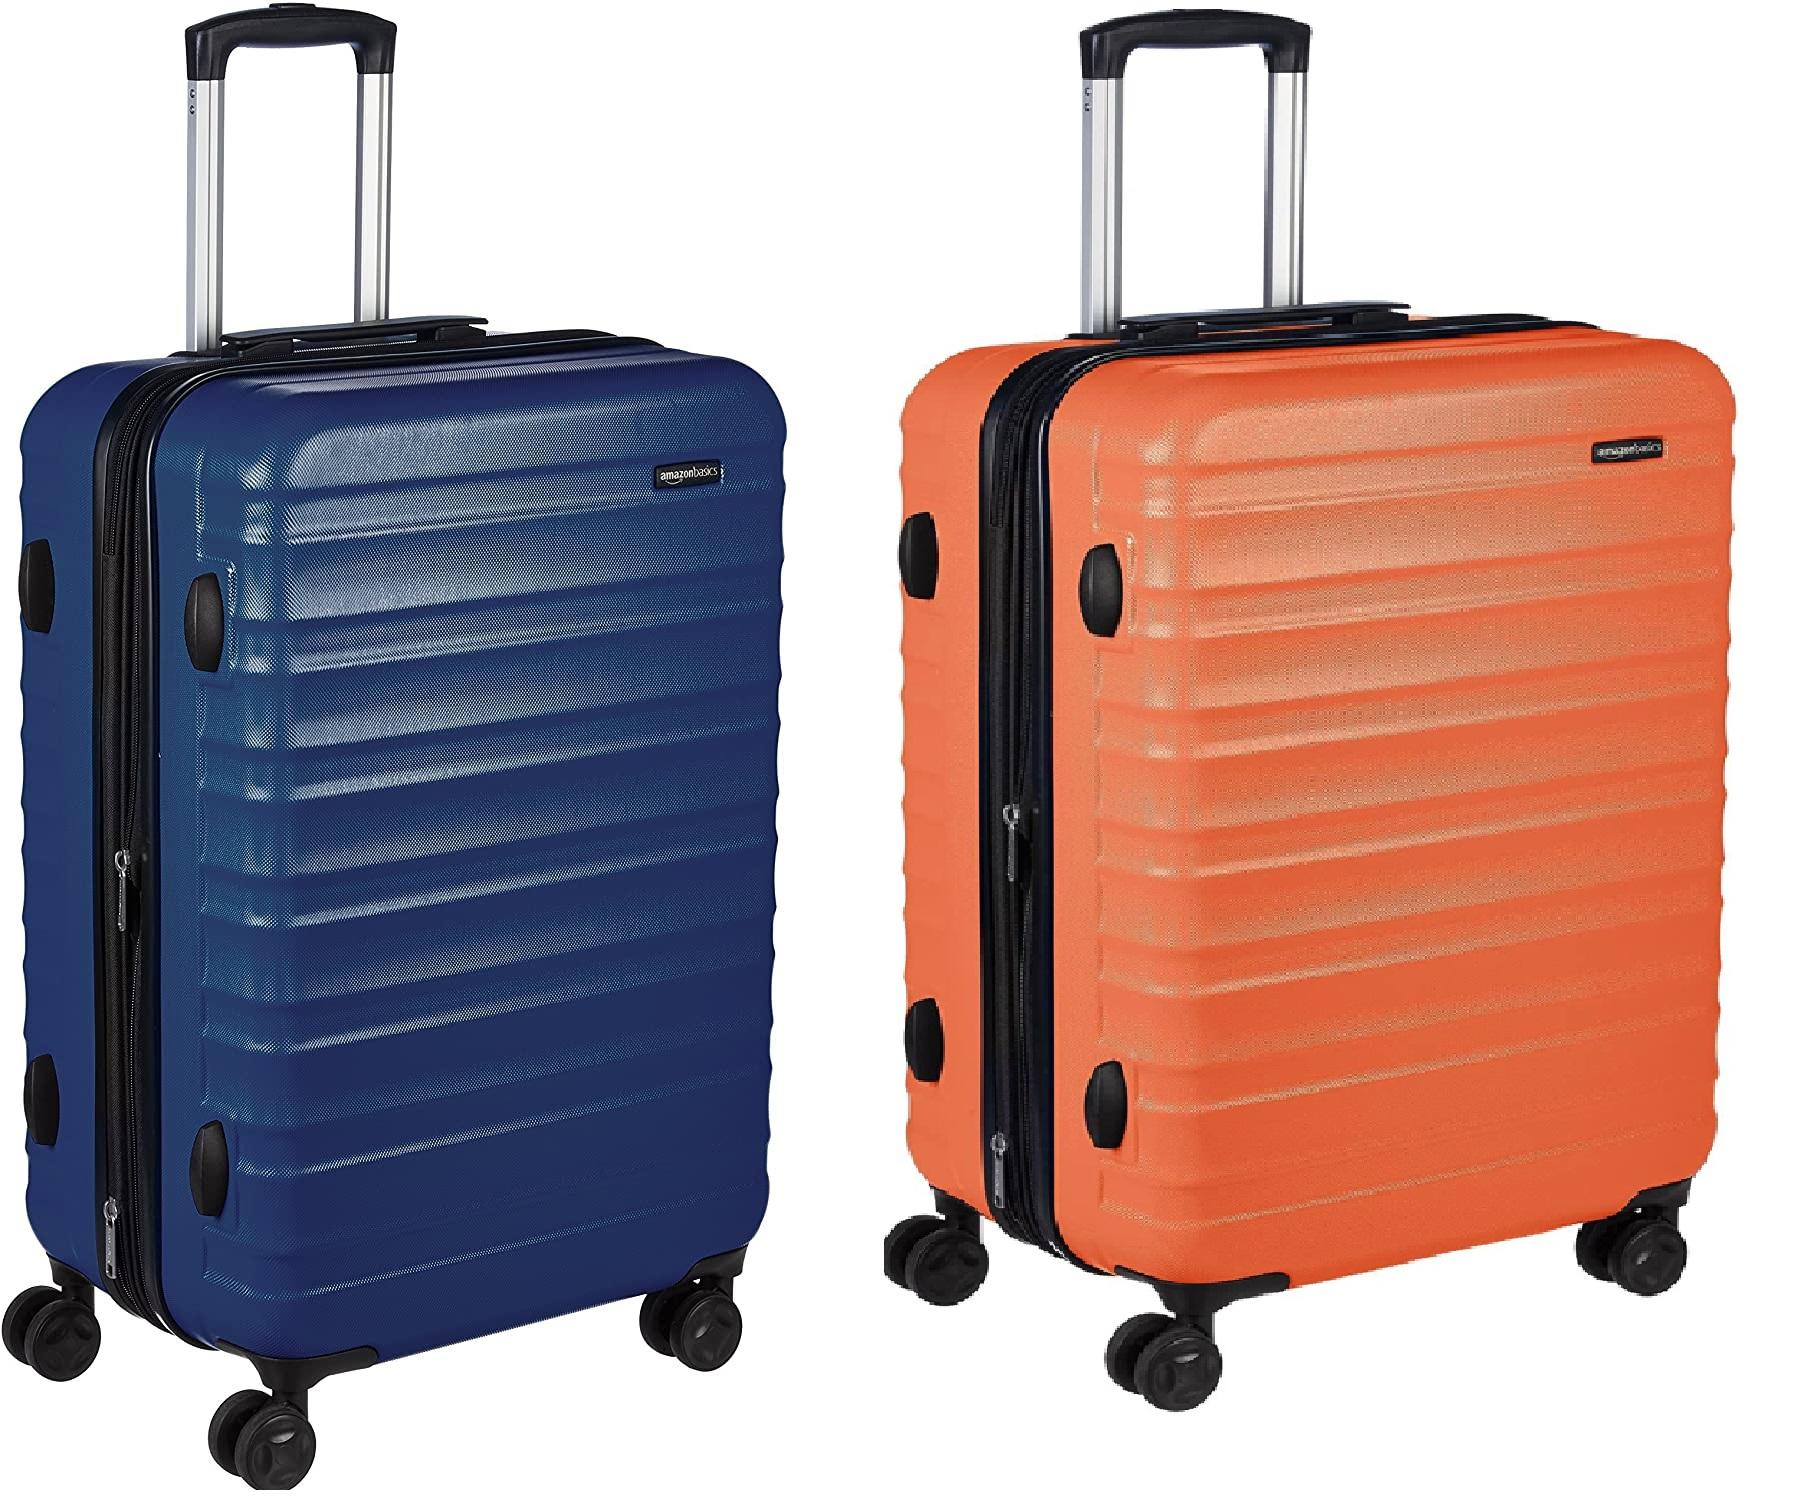 AmazonBasics: Maleta de viaje rígida giratoria, 68 cm. Colores en oferta: azul marino y naranja - Mínimo histórico